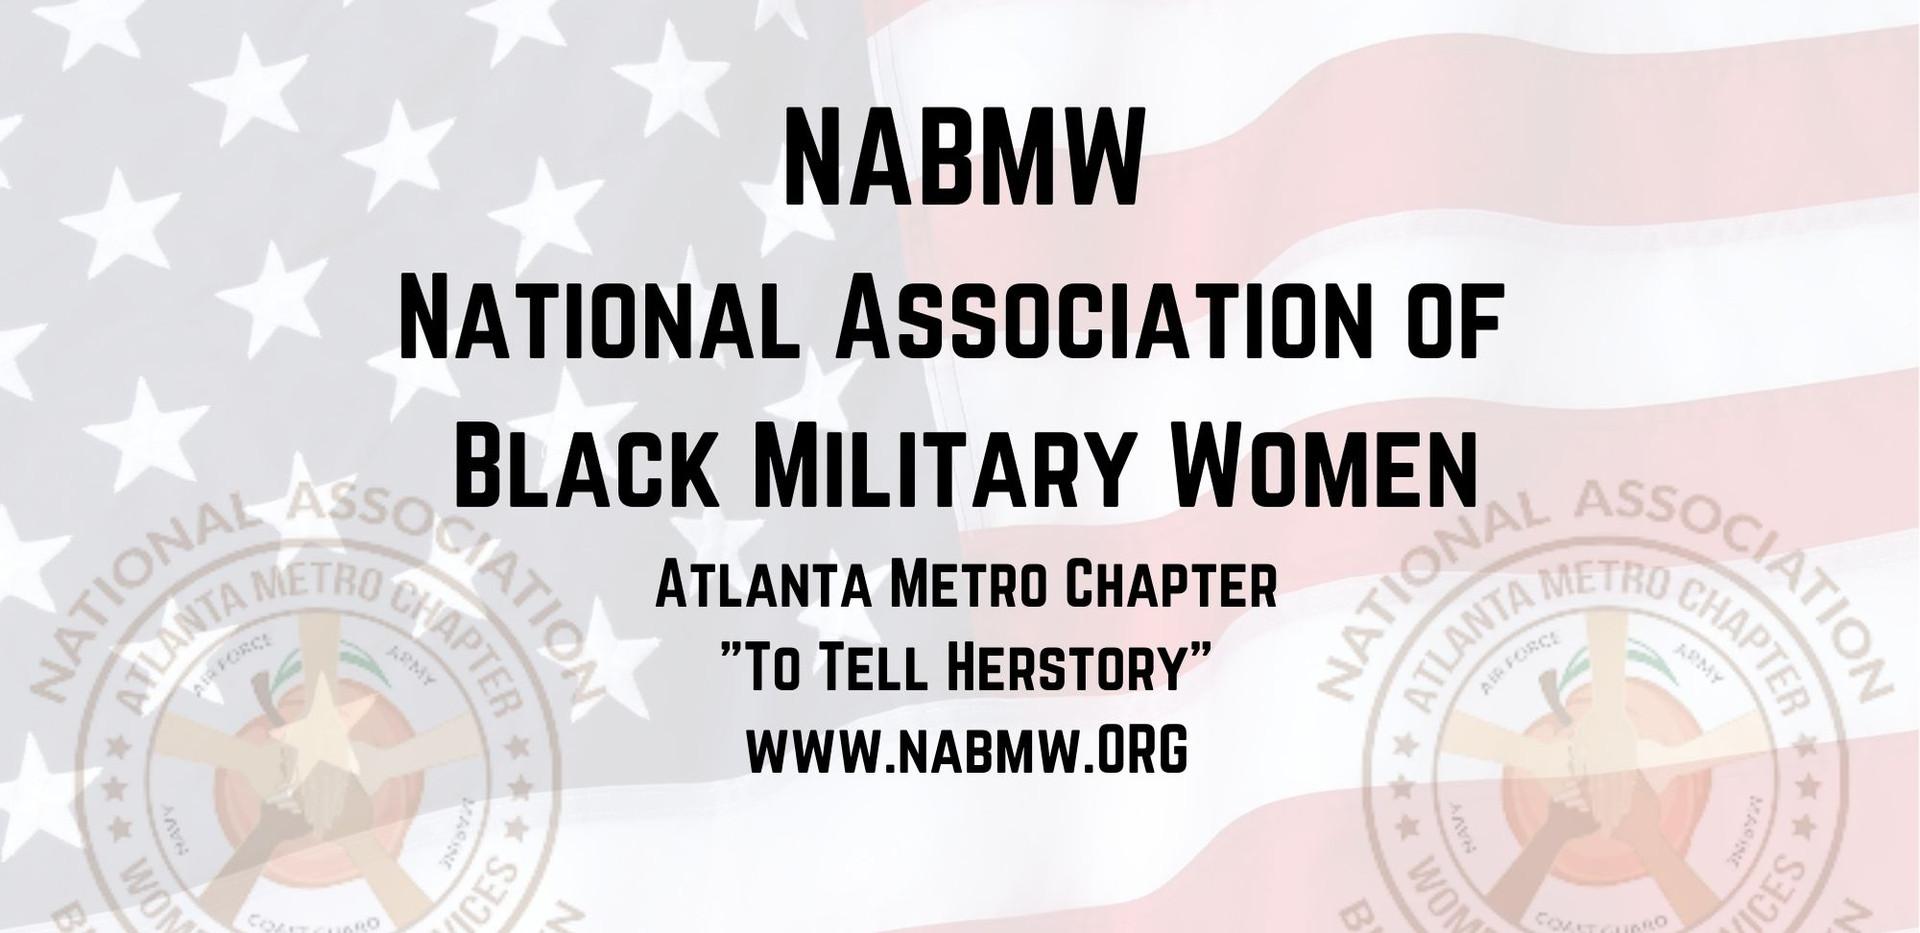 NABMW Gallery (2).jpg